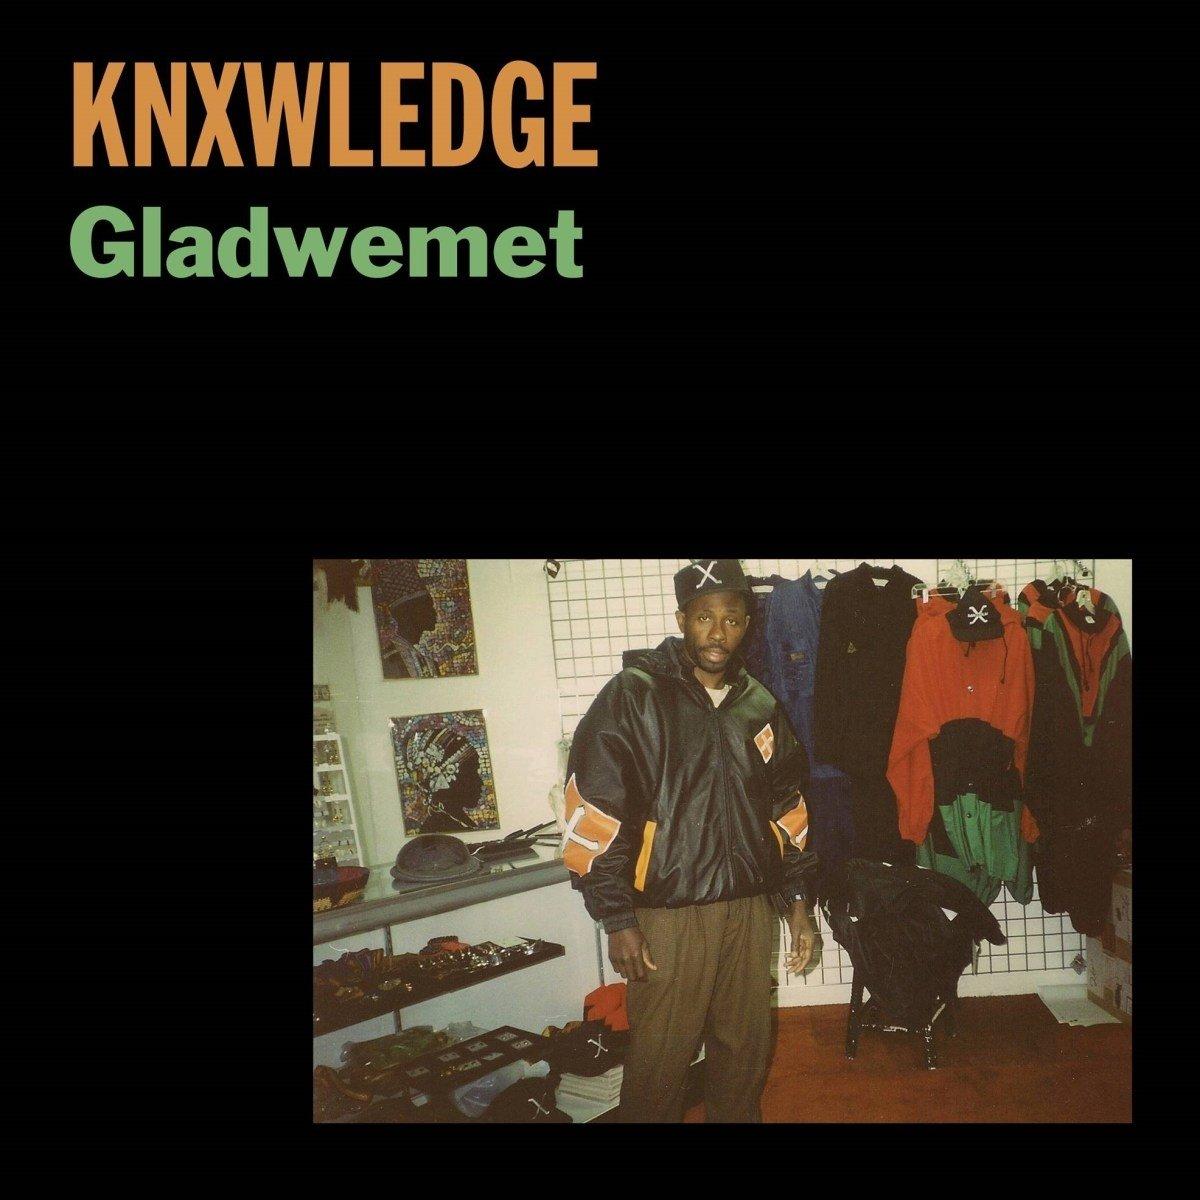 Vinilo : Knxwledge - Gladwemet (7 Inch Single)